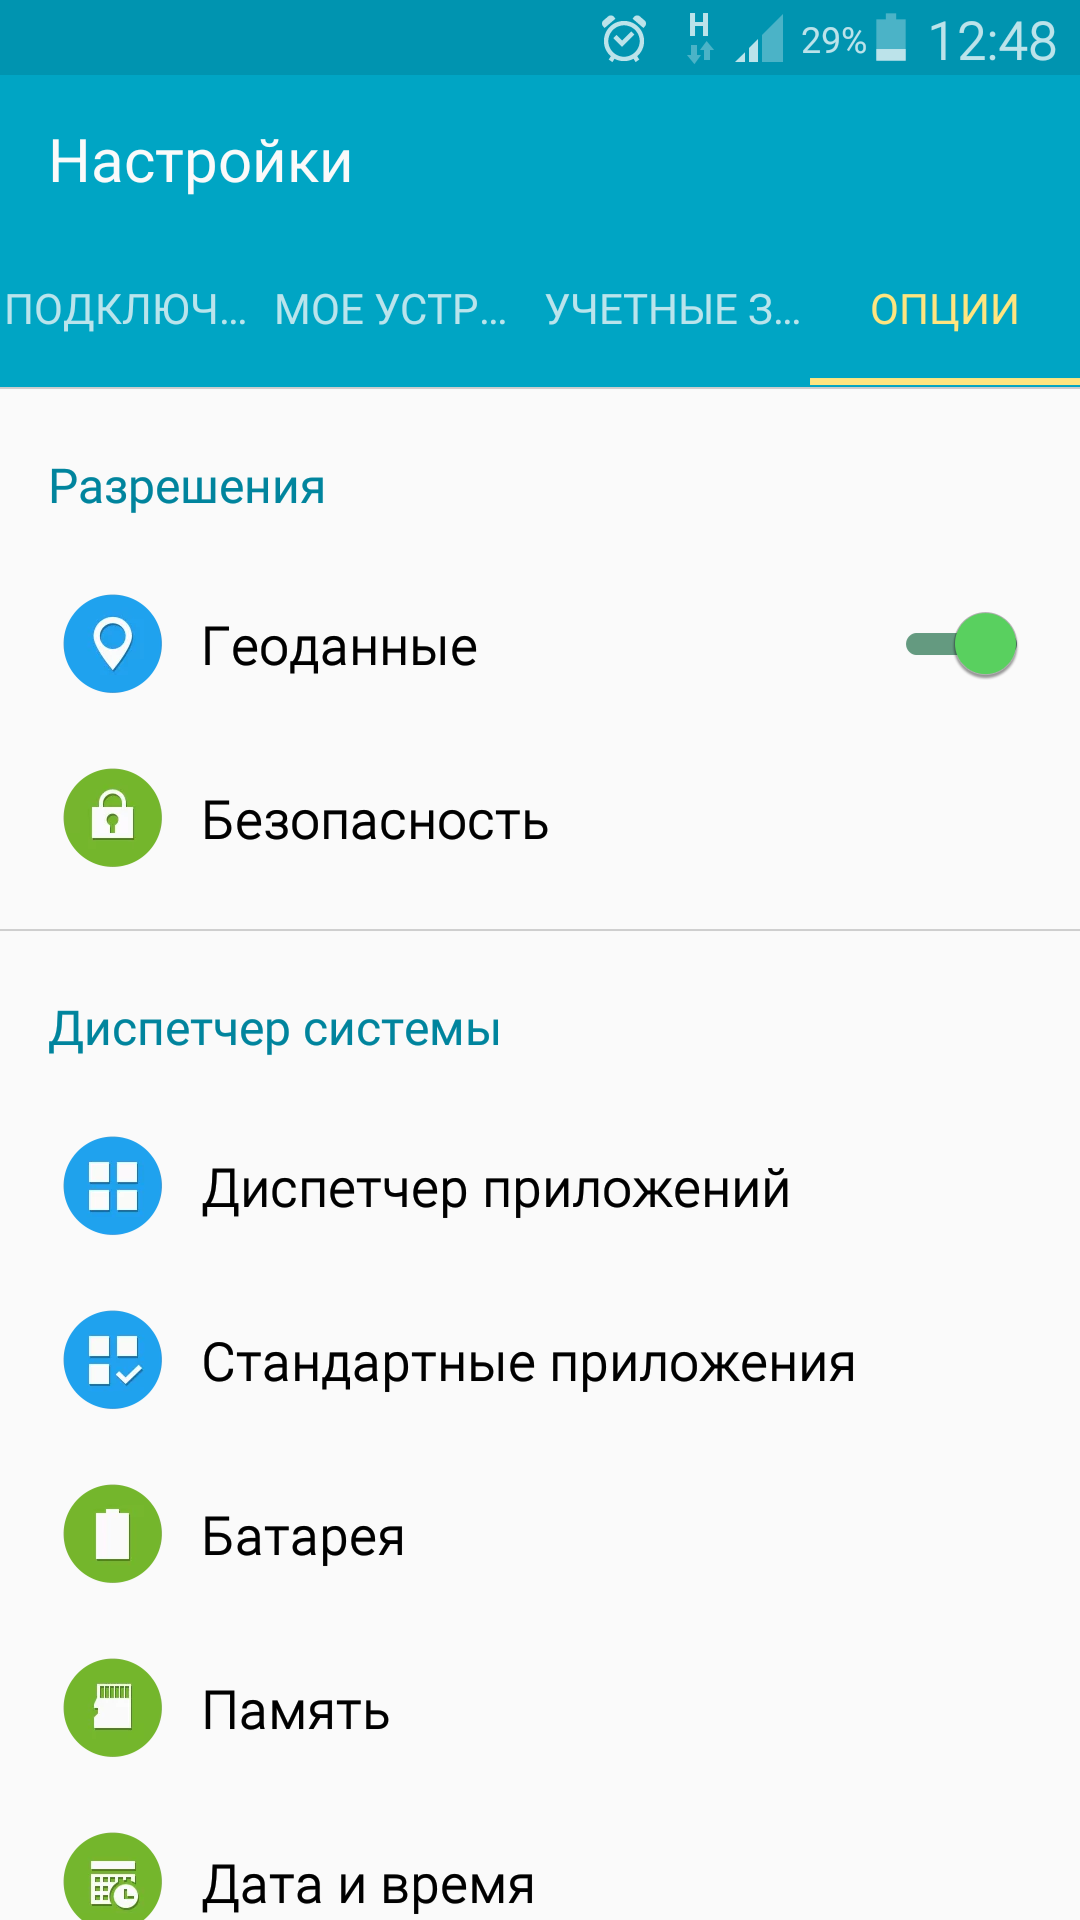 Установка apk файлов на андроид